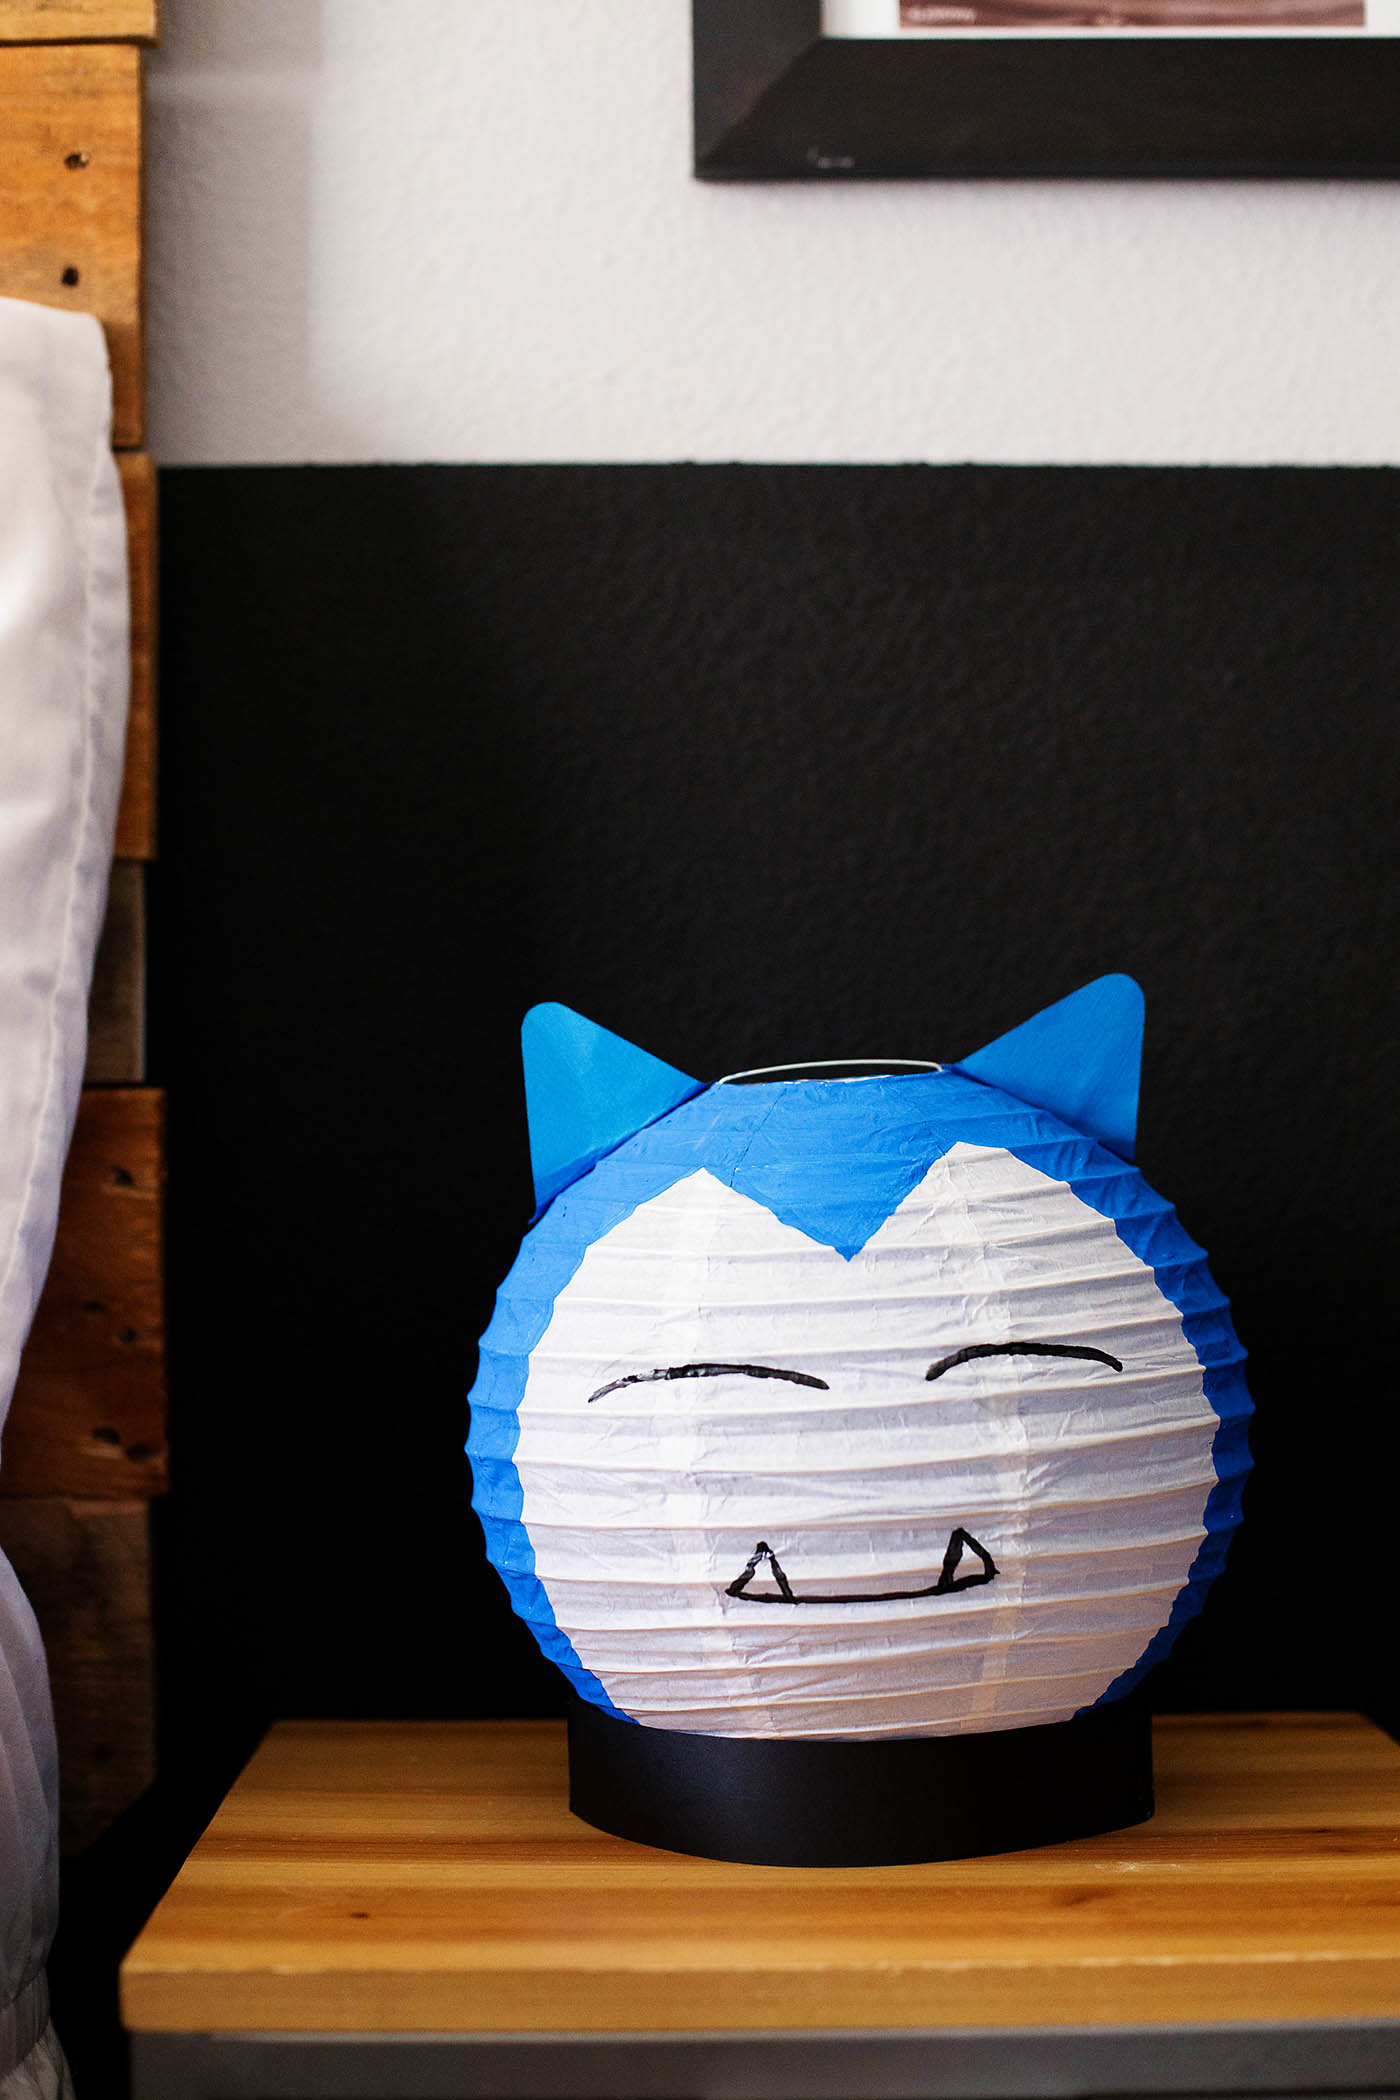 DIY Pokémon Inspired Snorlax Lantern - a fun craft idea for Pokémon and Pokémon Go fans!